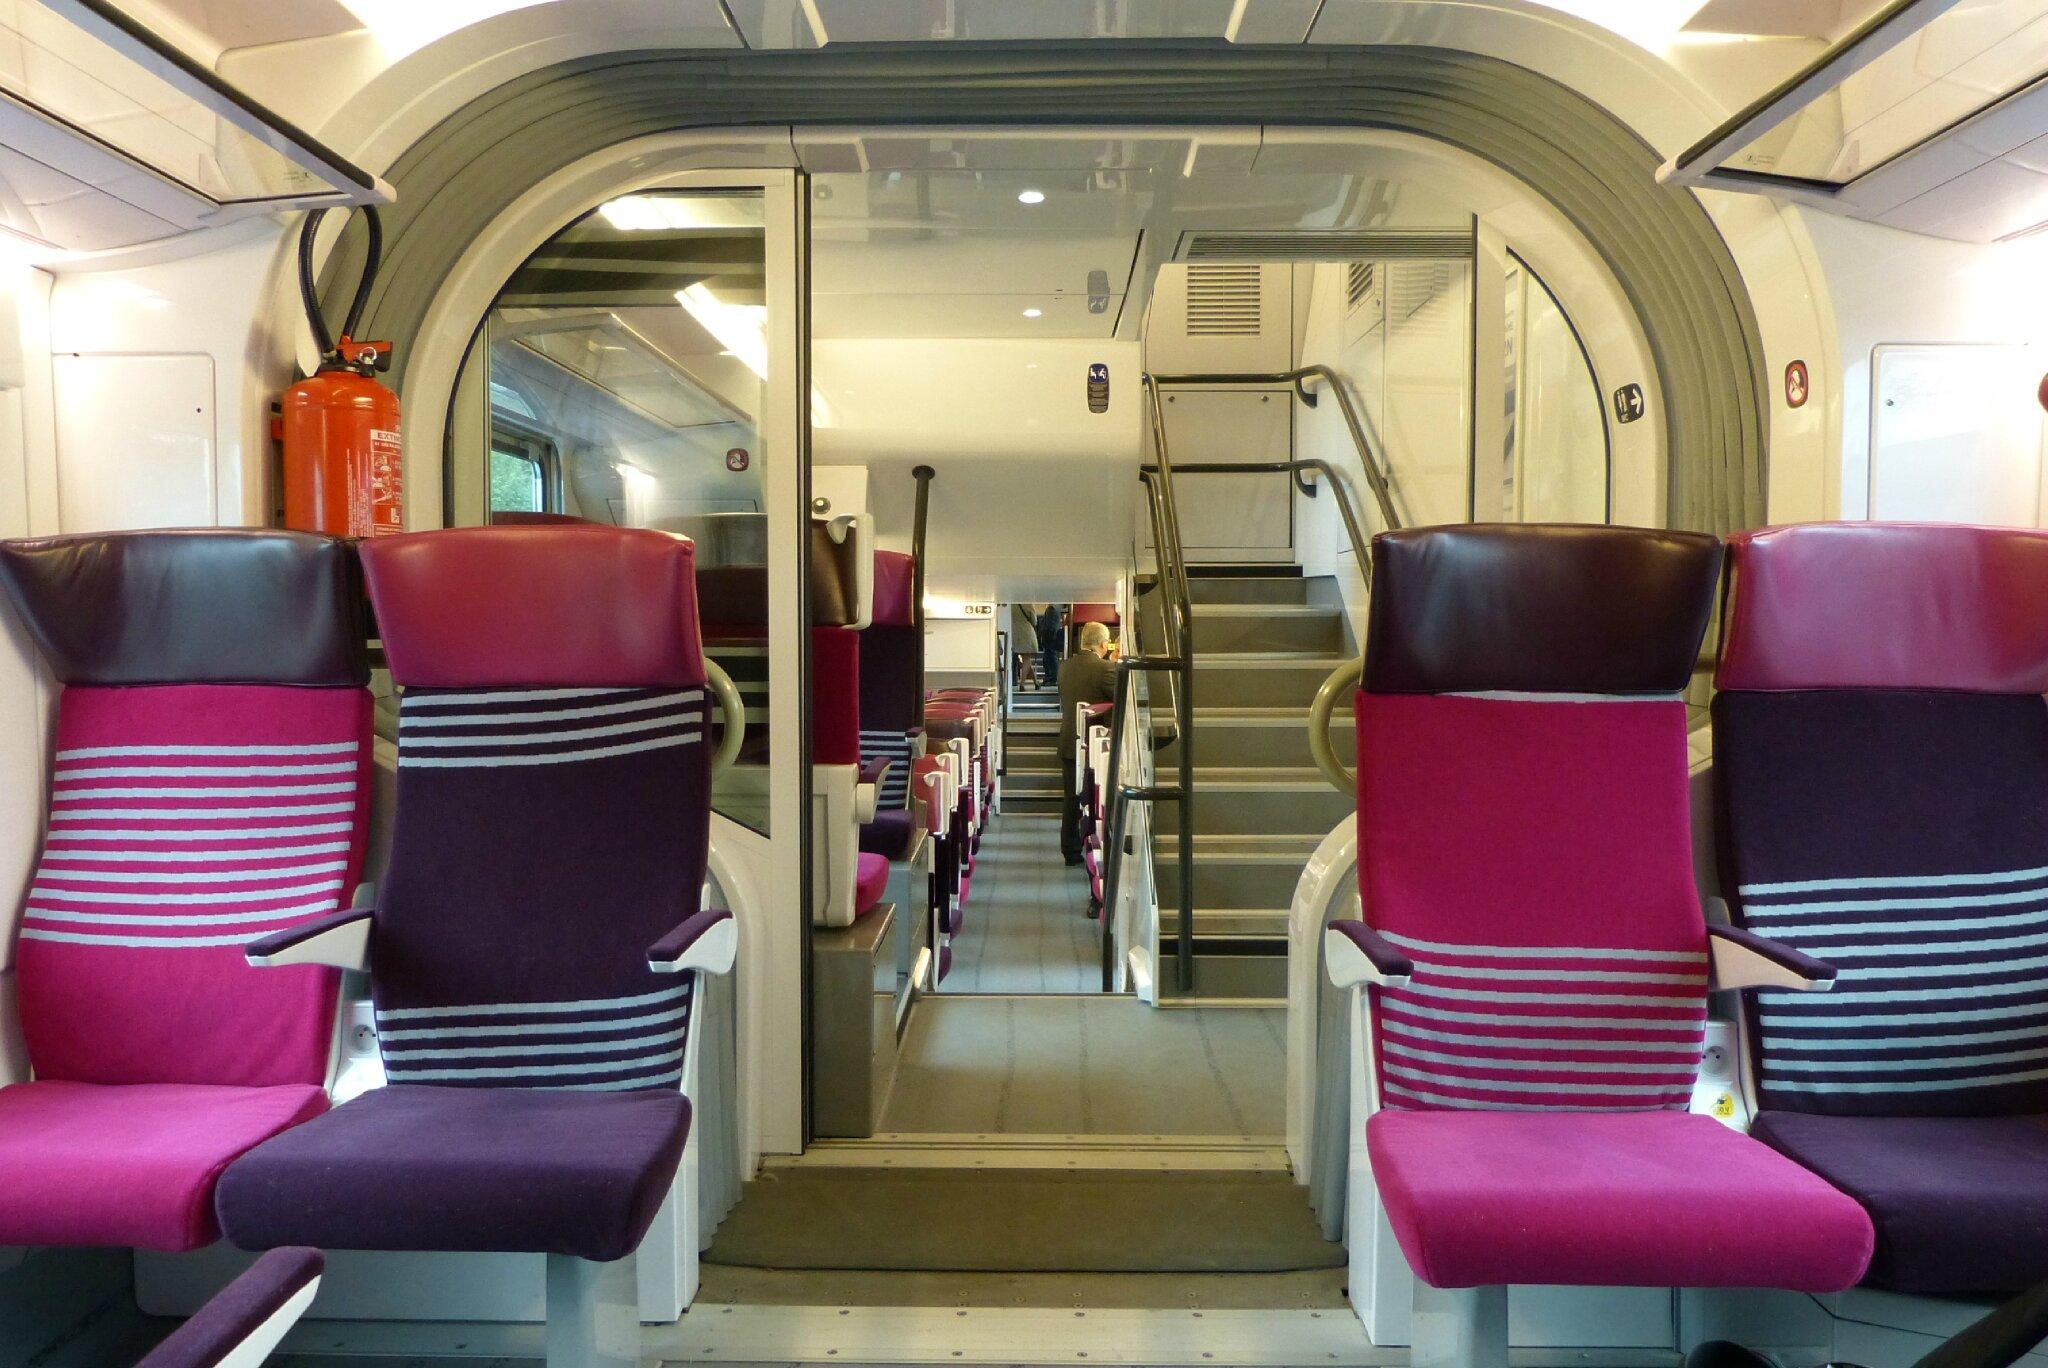 la gamme r gio2n transportrail le webmagazine ferroviaire. Black Bedroom Furniture Sets. Home Design Ideas